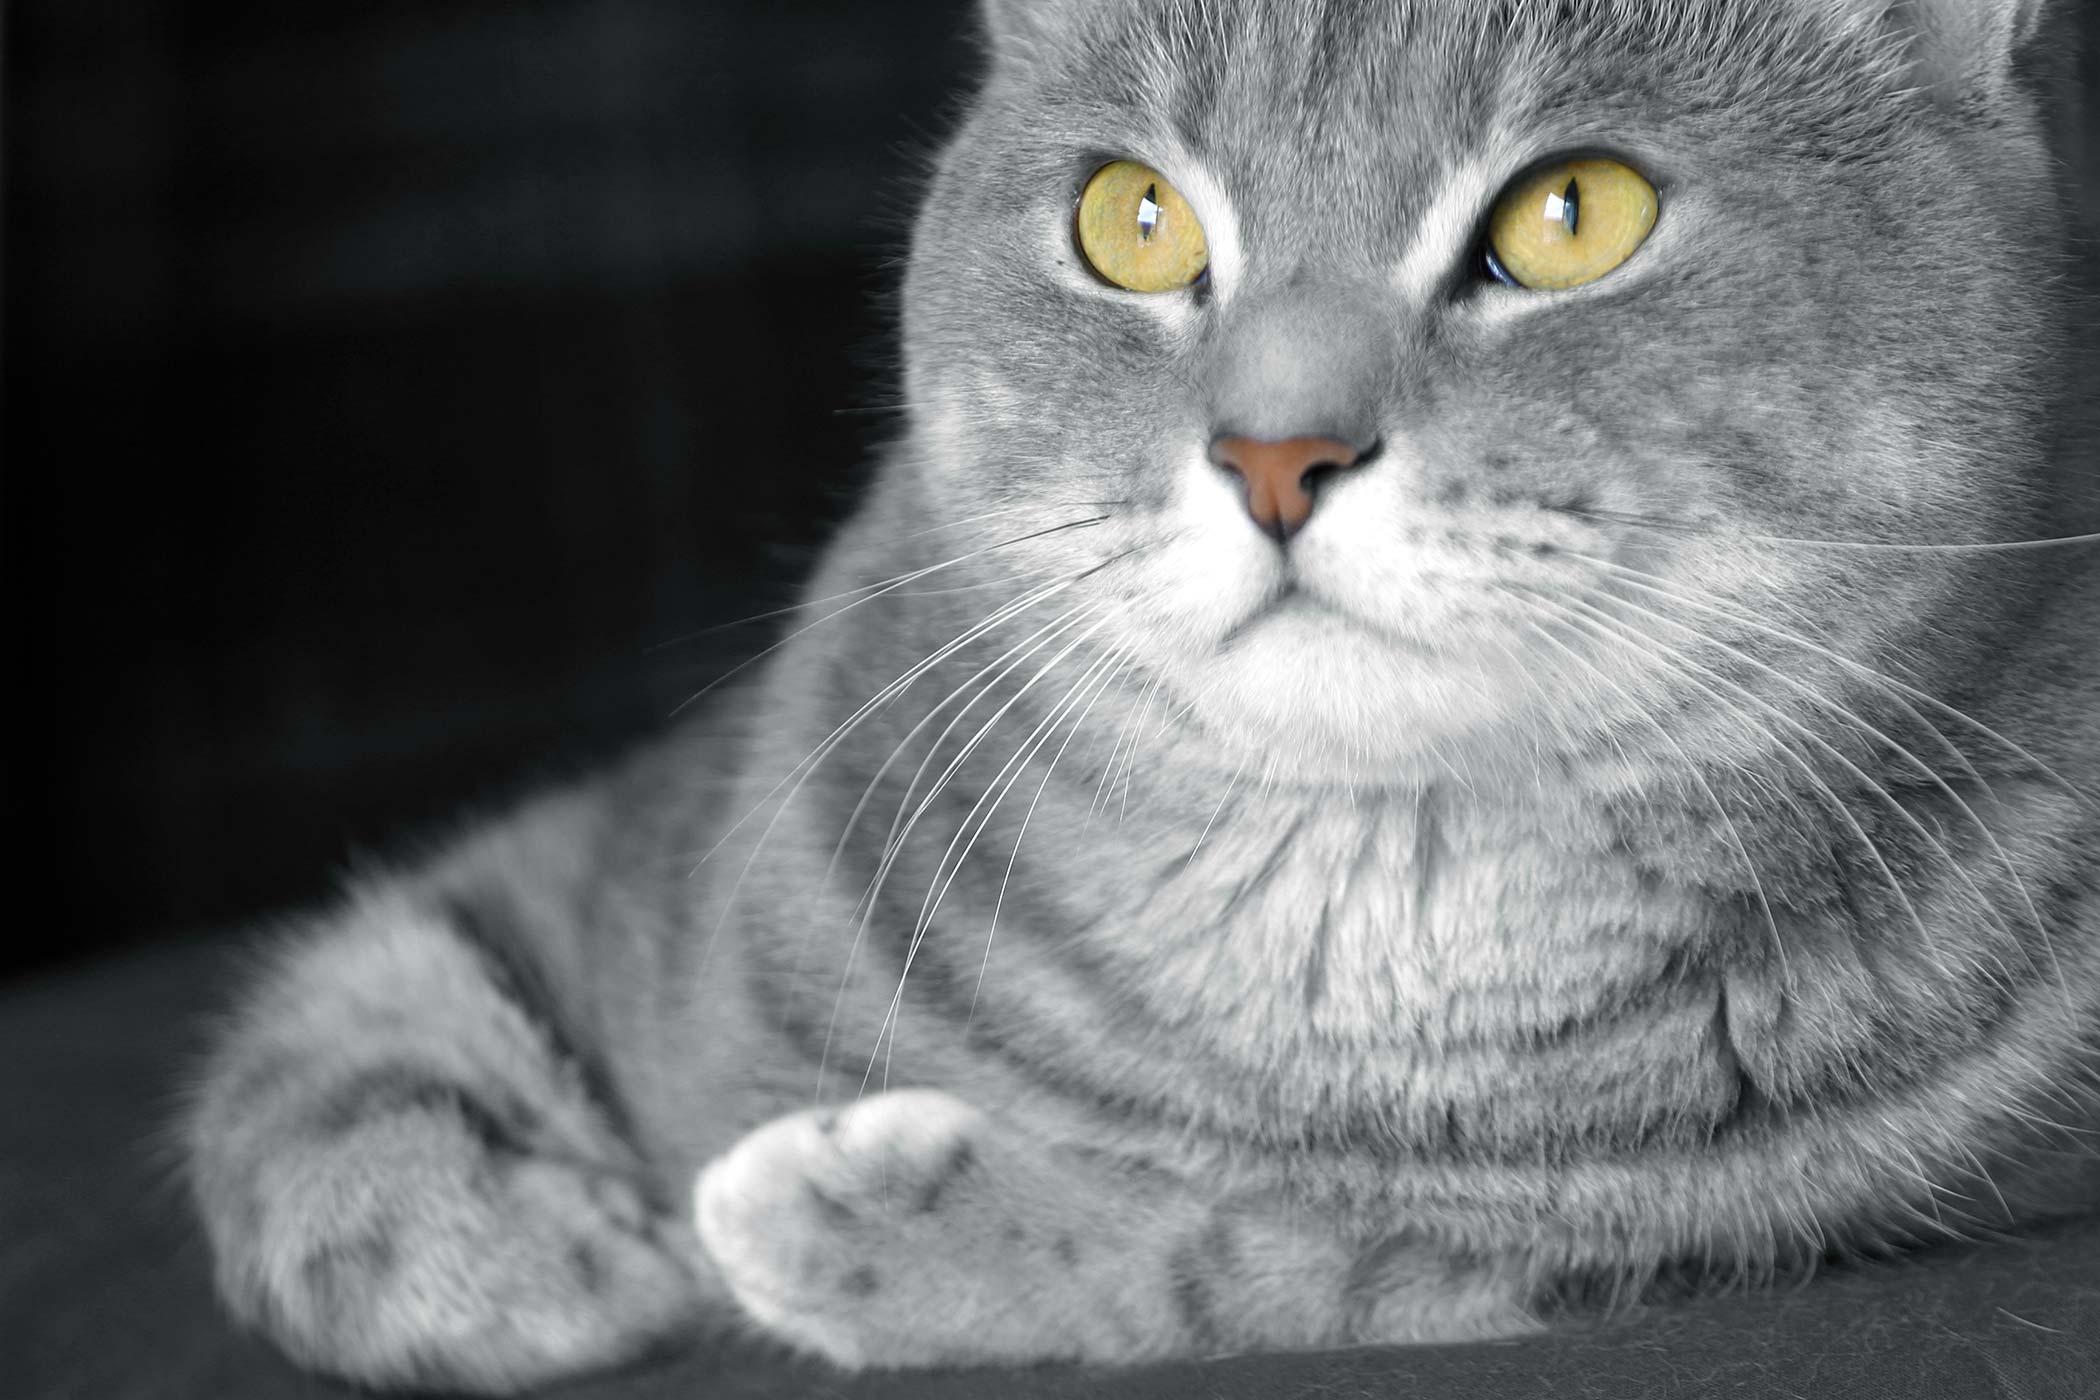 False Pregnancy in Cats